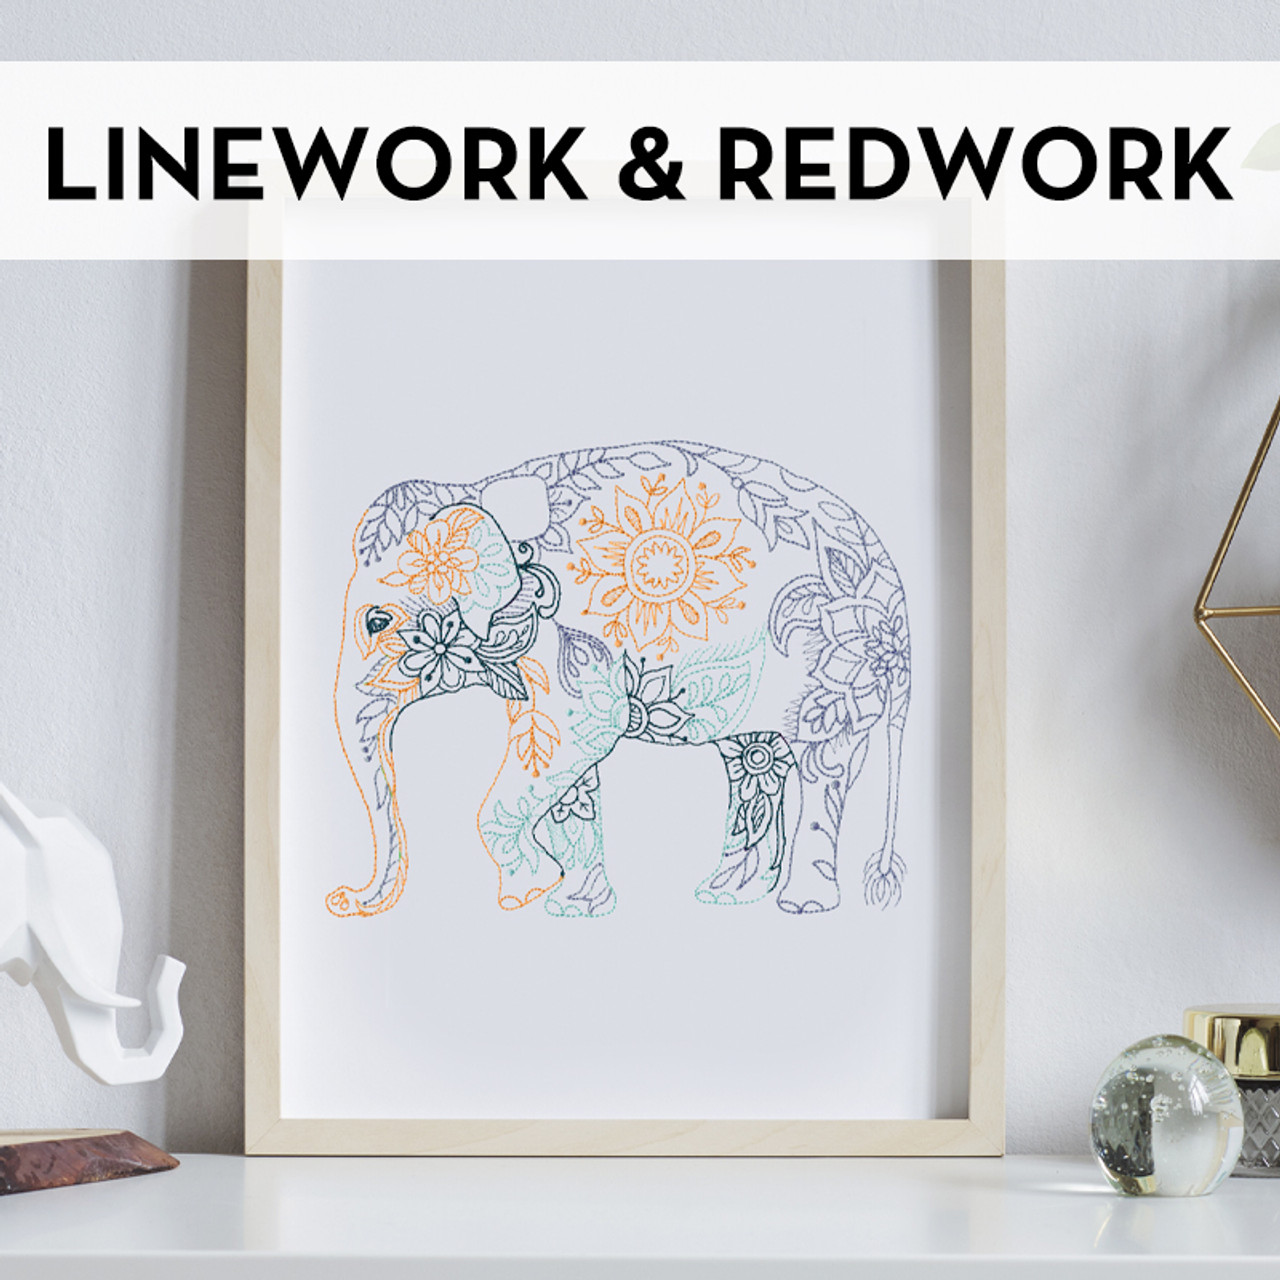 Linework & Redwork